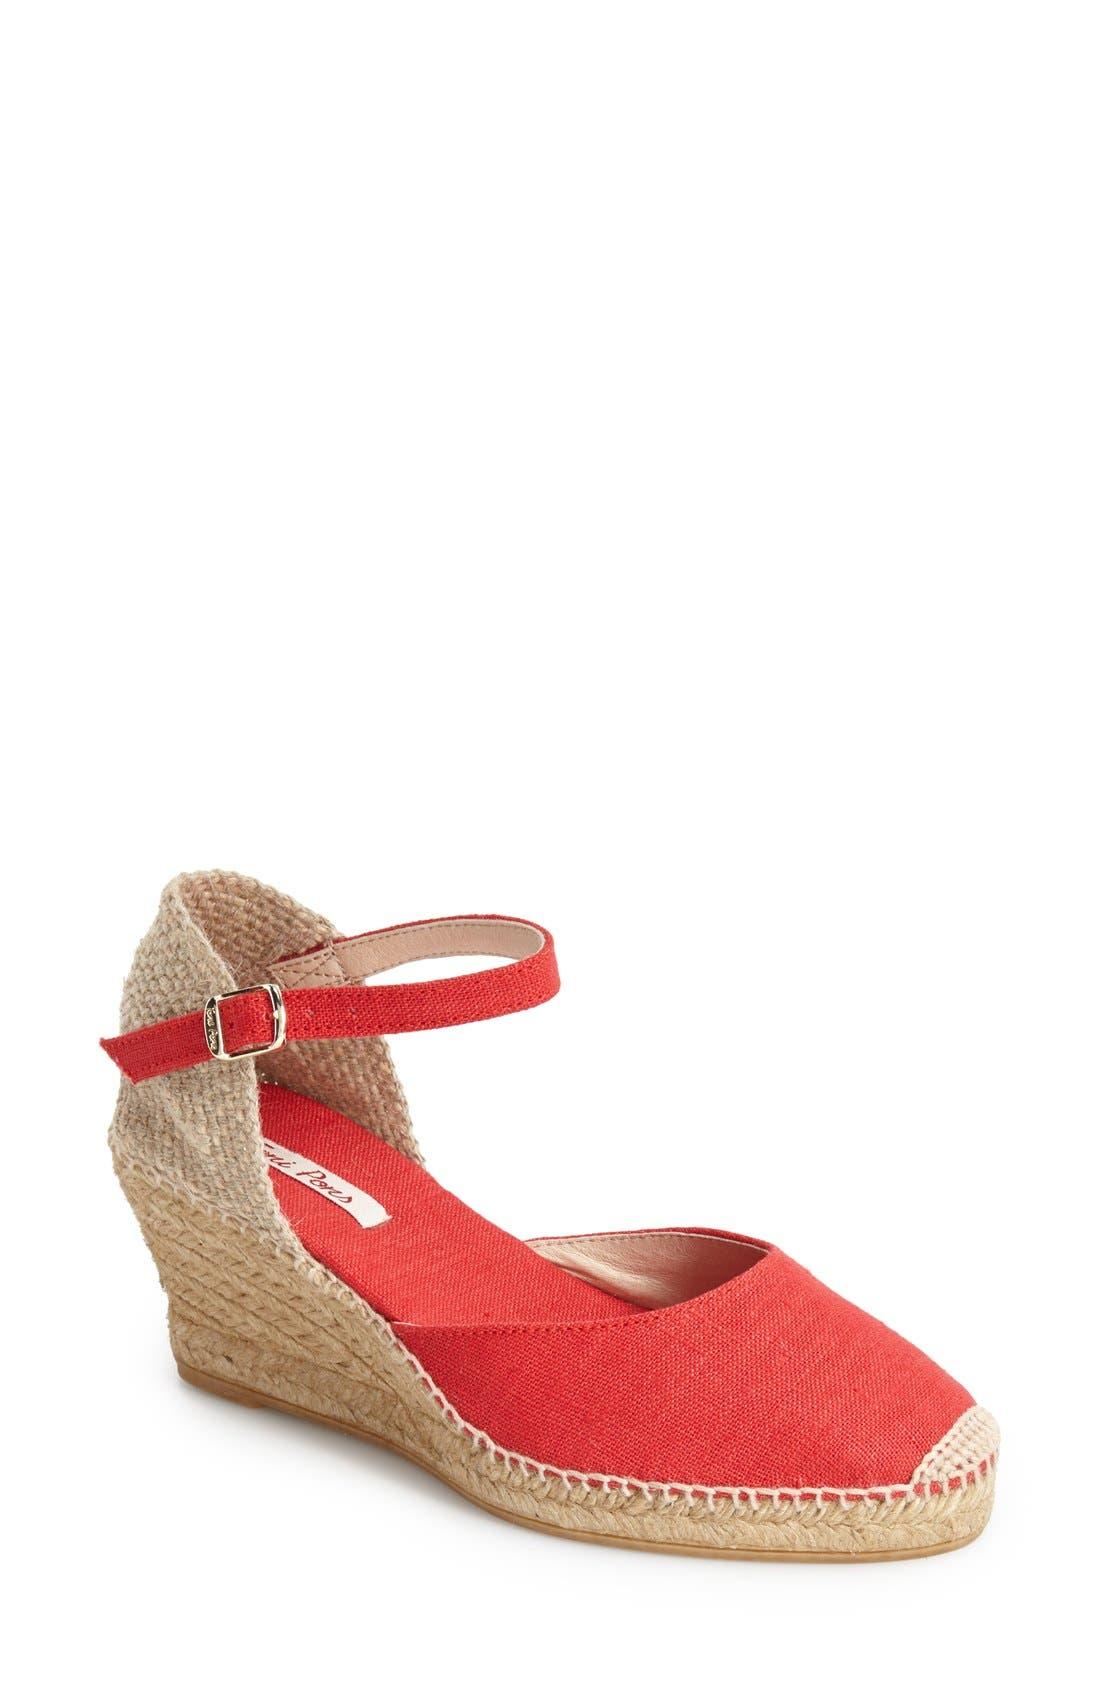 Main Image - Toni Pons 'Caldes' Linen Wedge Sandal (Women)